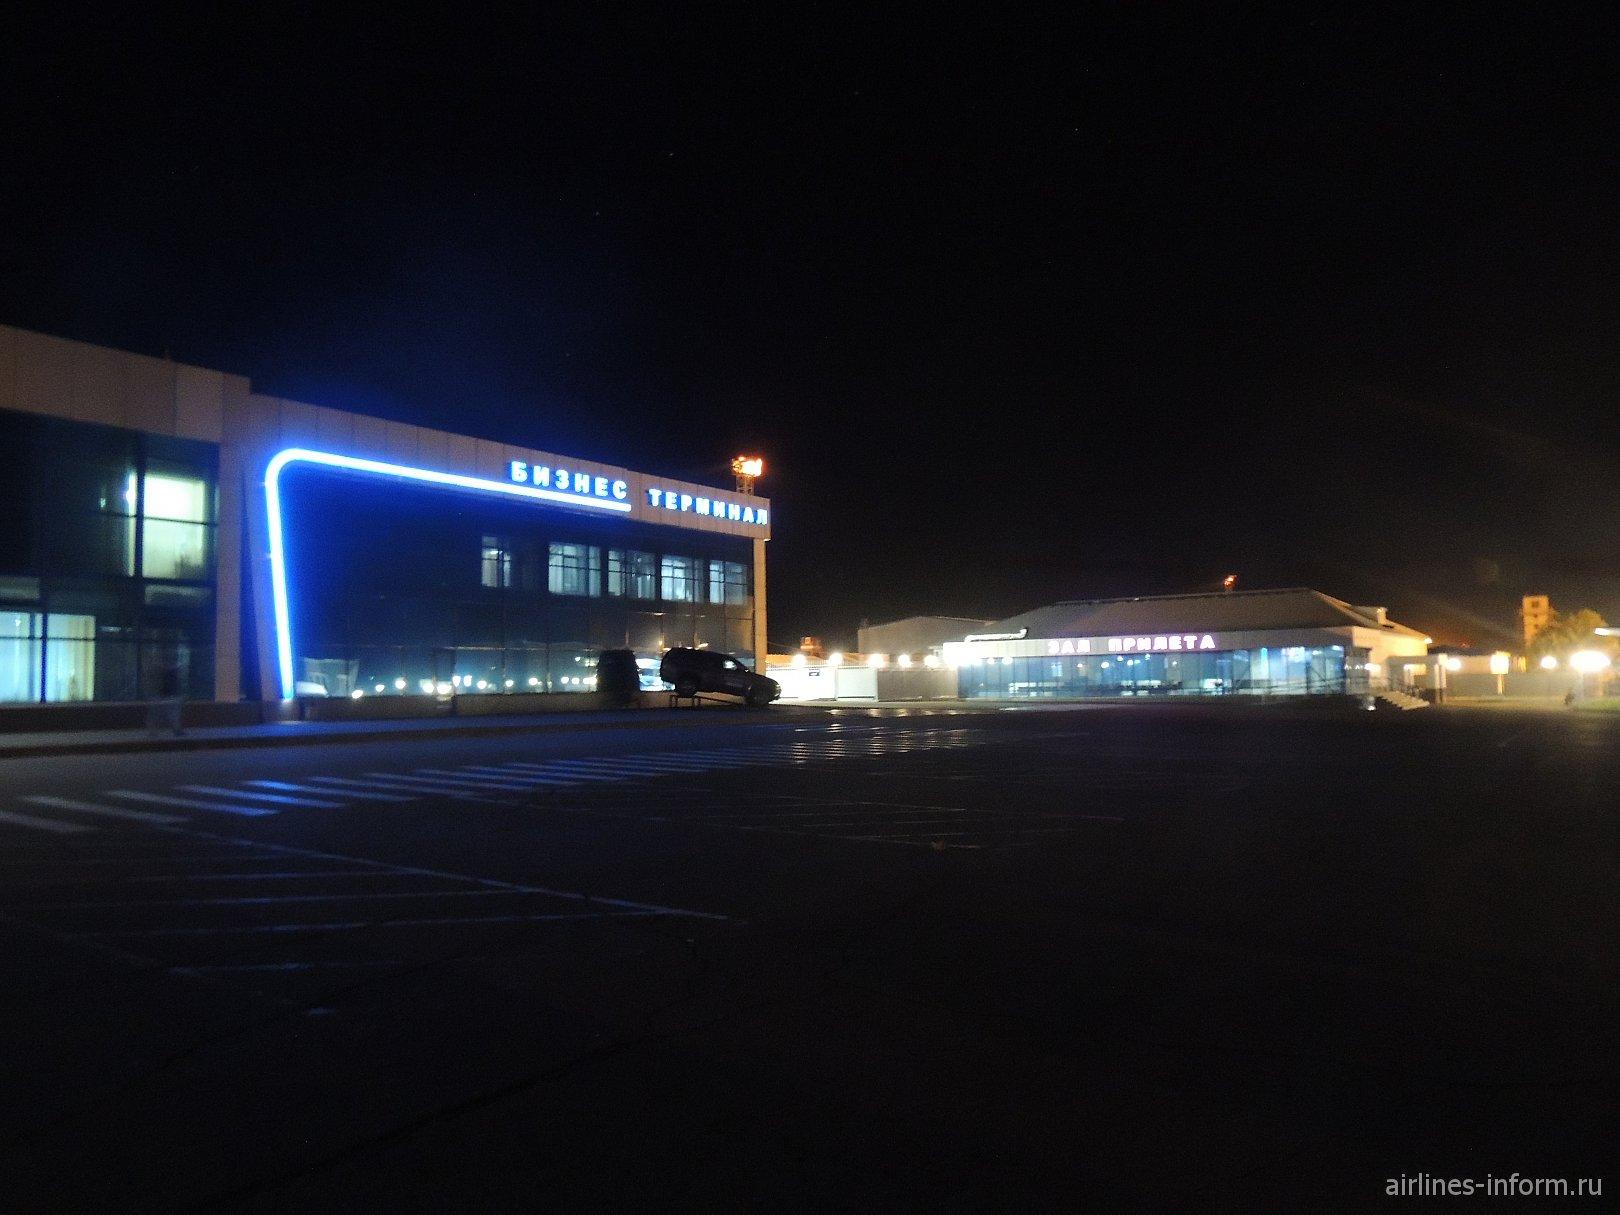 Бизнес-терминал и зал прилета аэропорта Барнаул имени Германа Титова